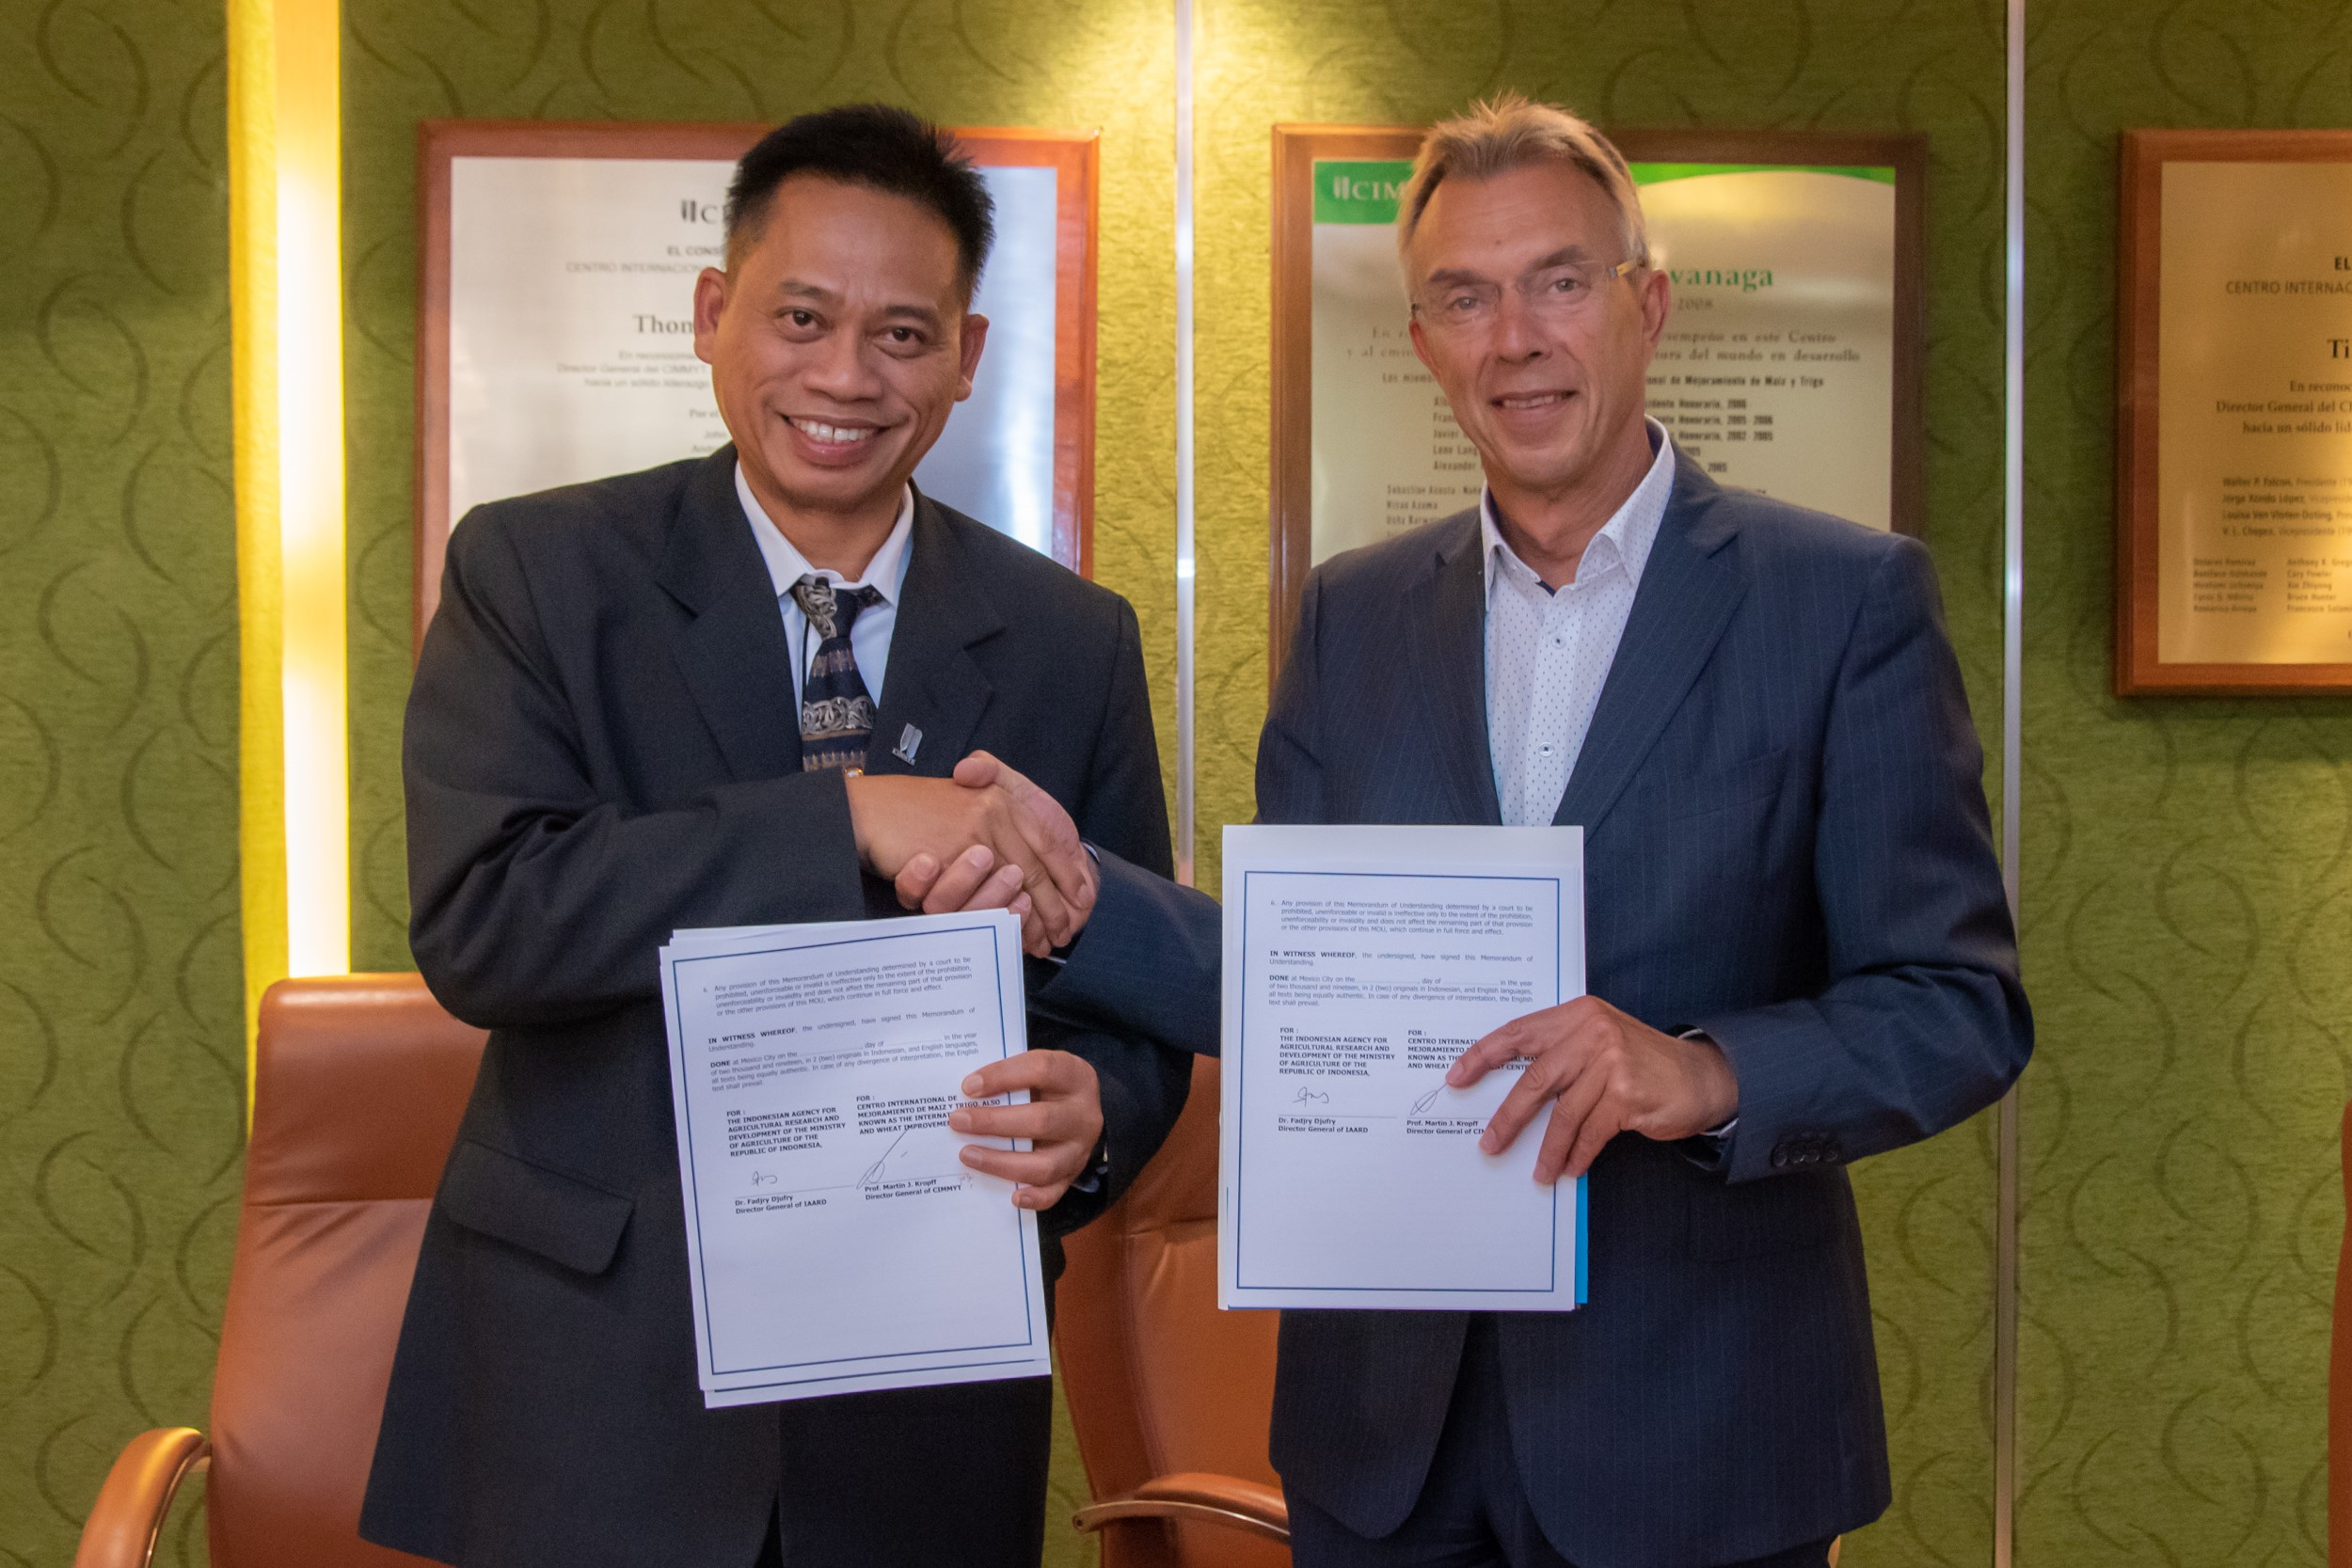 The Director General of IAARD, Fadjry Djufry (left), and the Director General of CIMMYT, Martin Kropff, signed a memorandum of understanding. (Photo: Alfonso Cortés/CIMMYT)